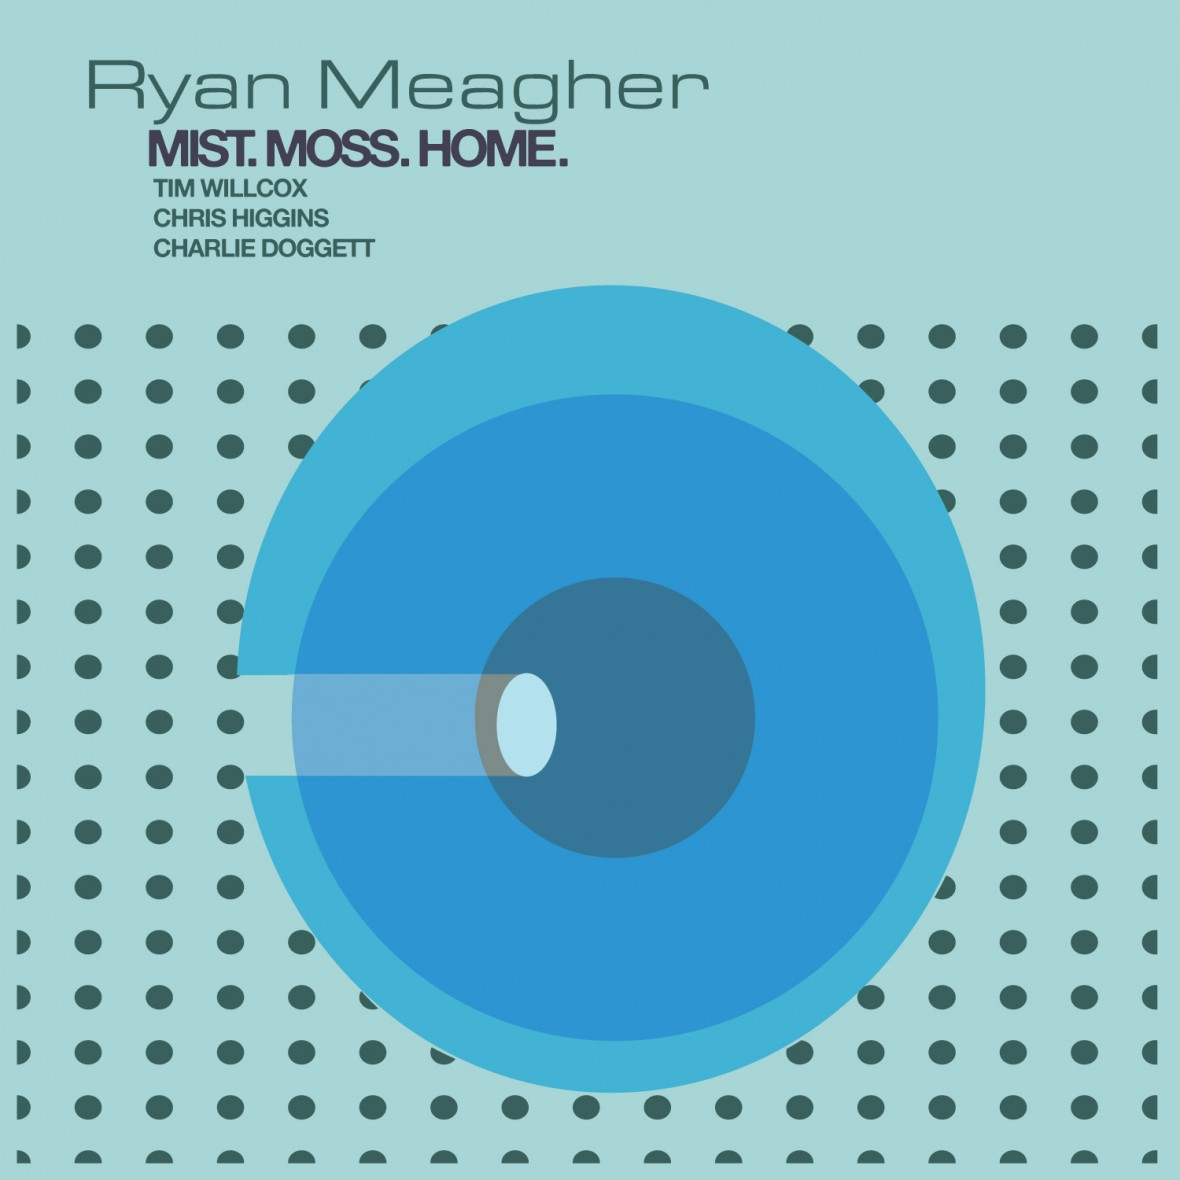 Mist Moss Home Ryan Meagher